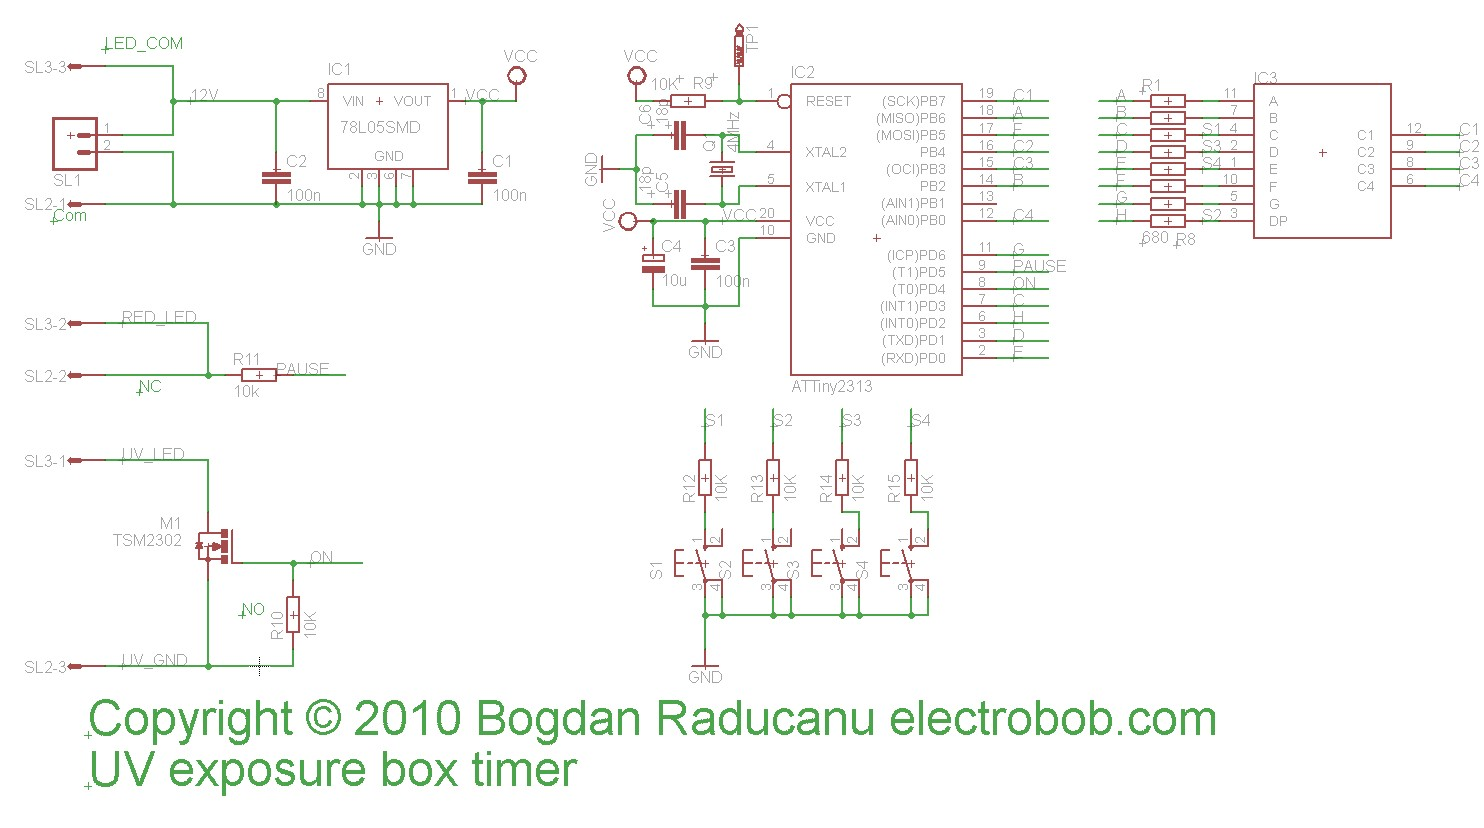 Led Uv Exposure Box Part 2 The Timer Electro Bob Clock Circuit Connection